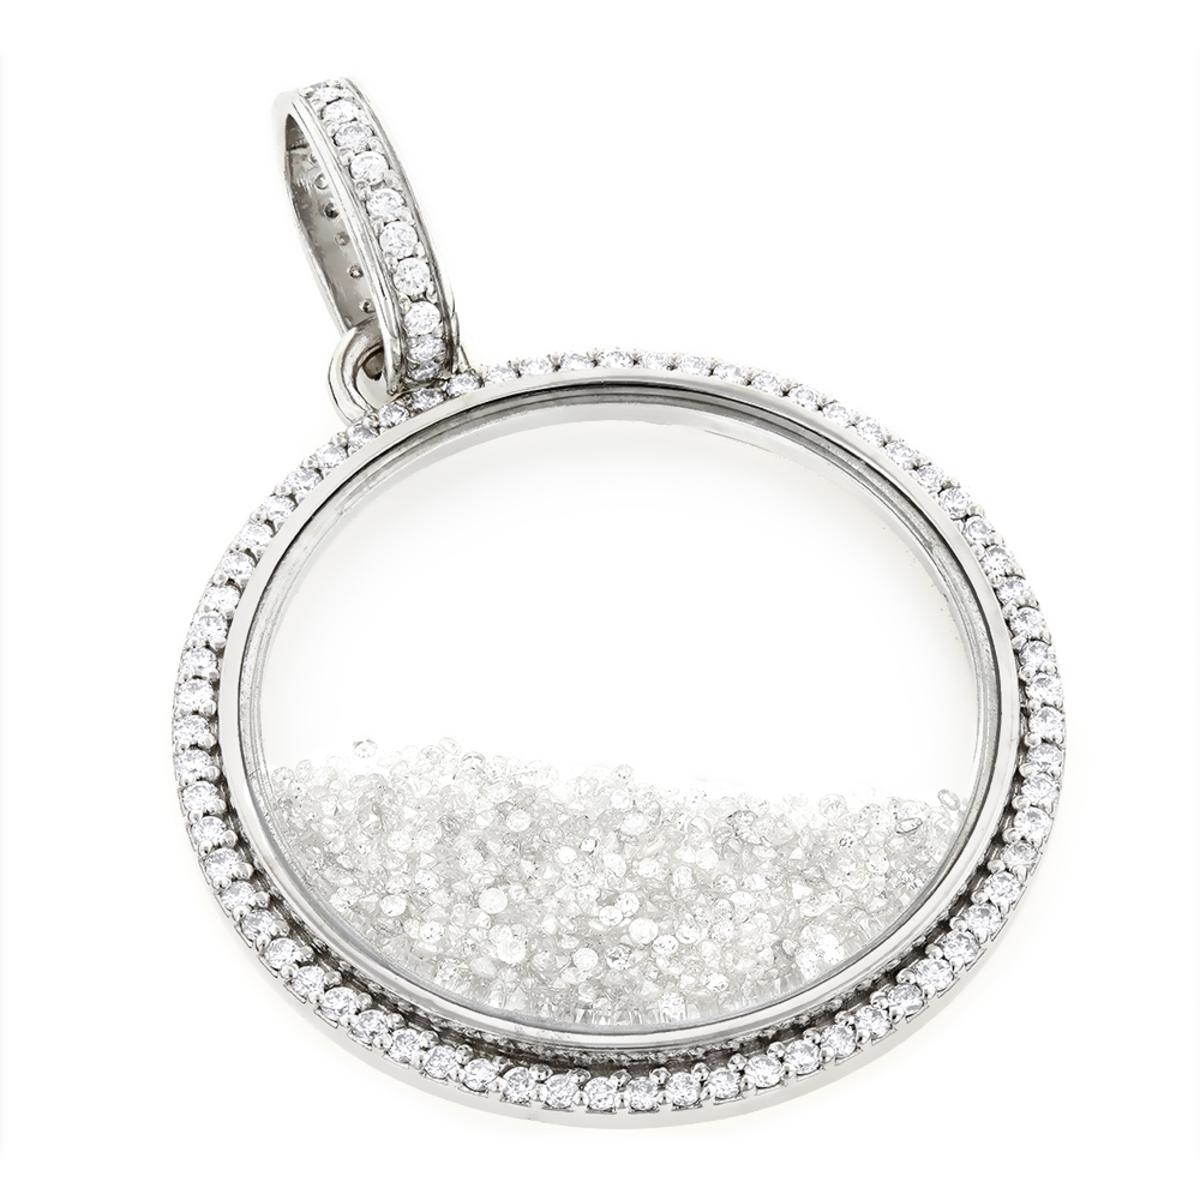 Custom Made Diamond Shaker Pendant 8.7ct Circle Jewelry